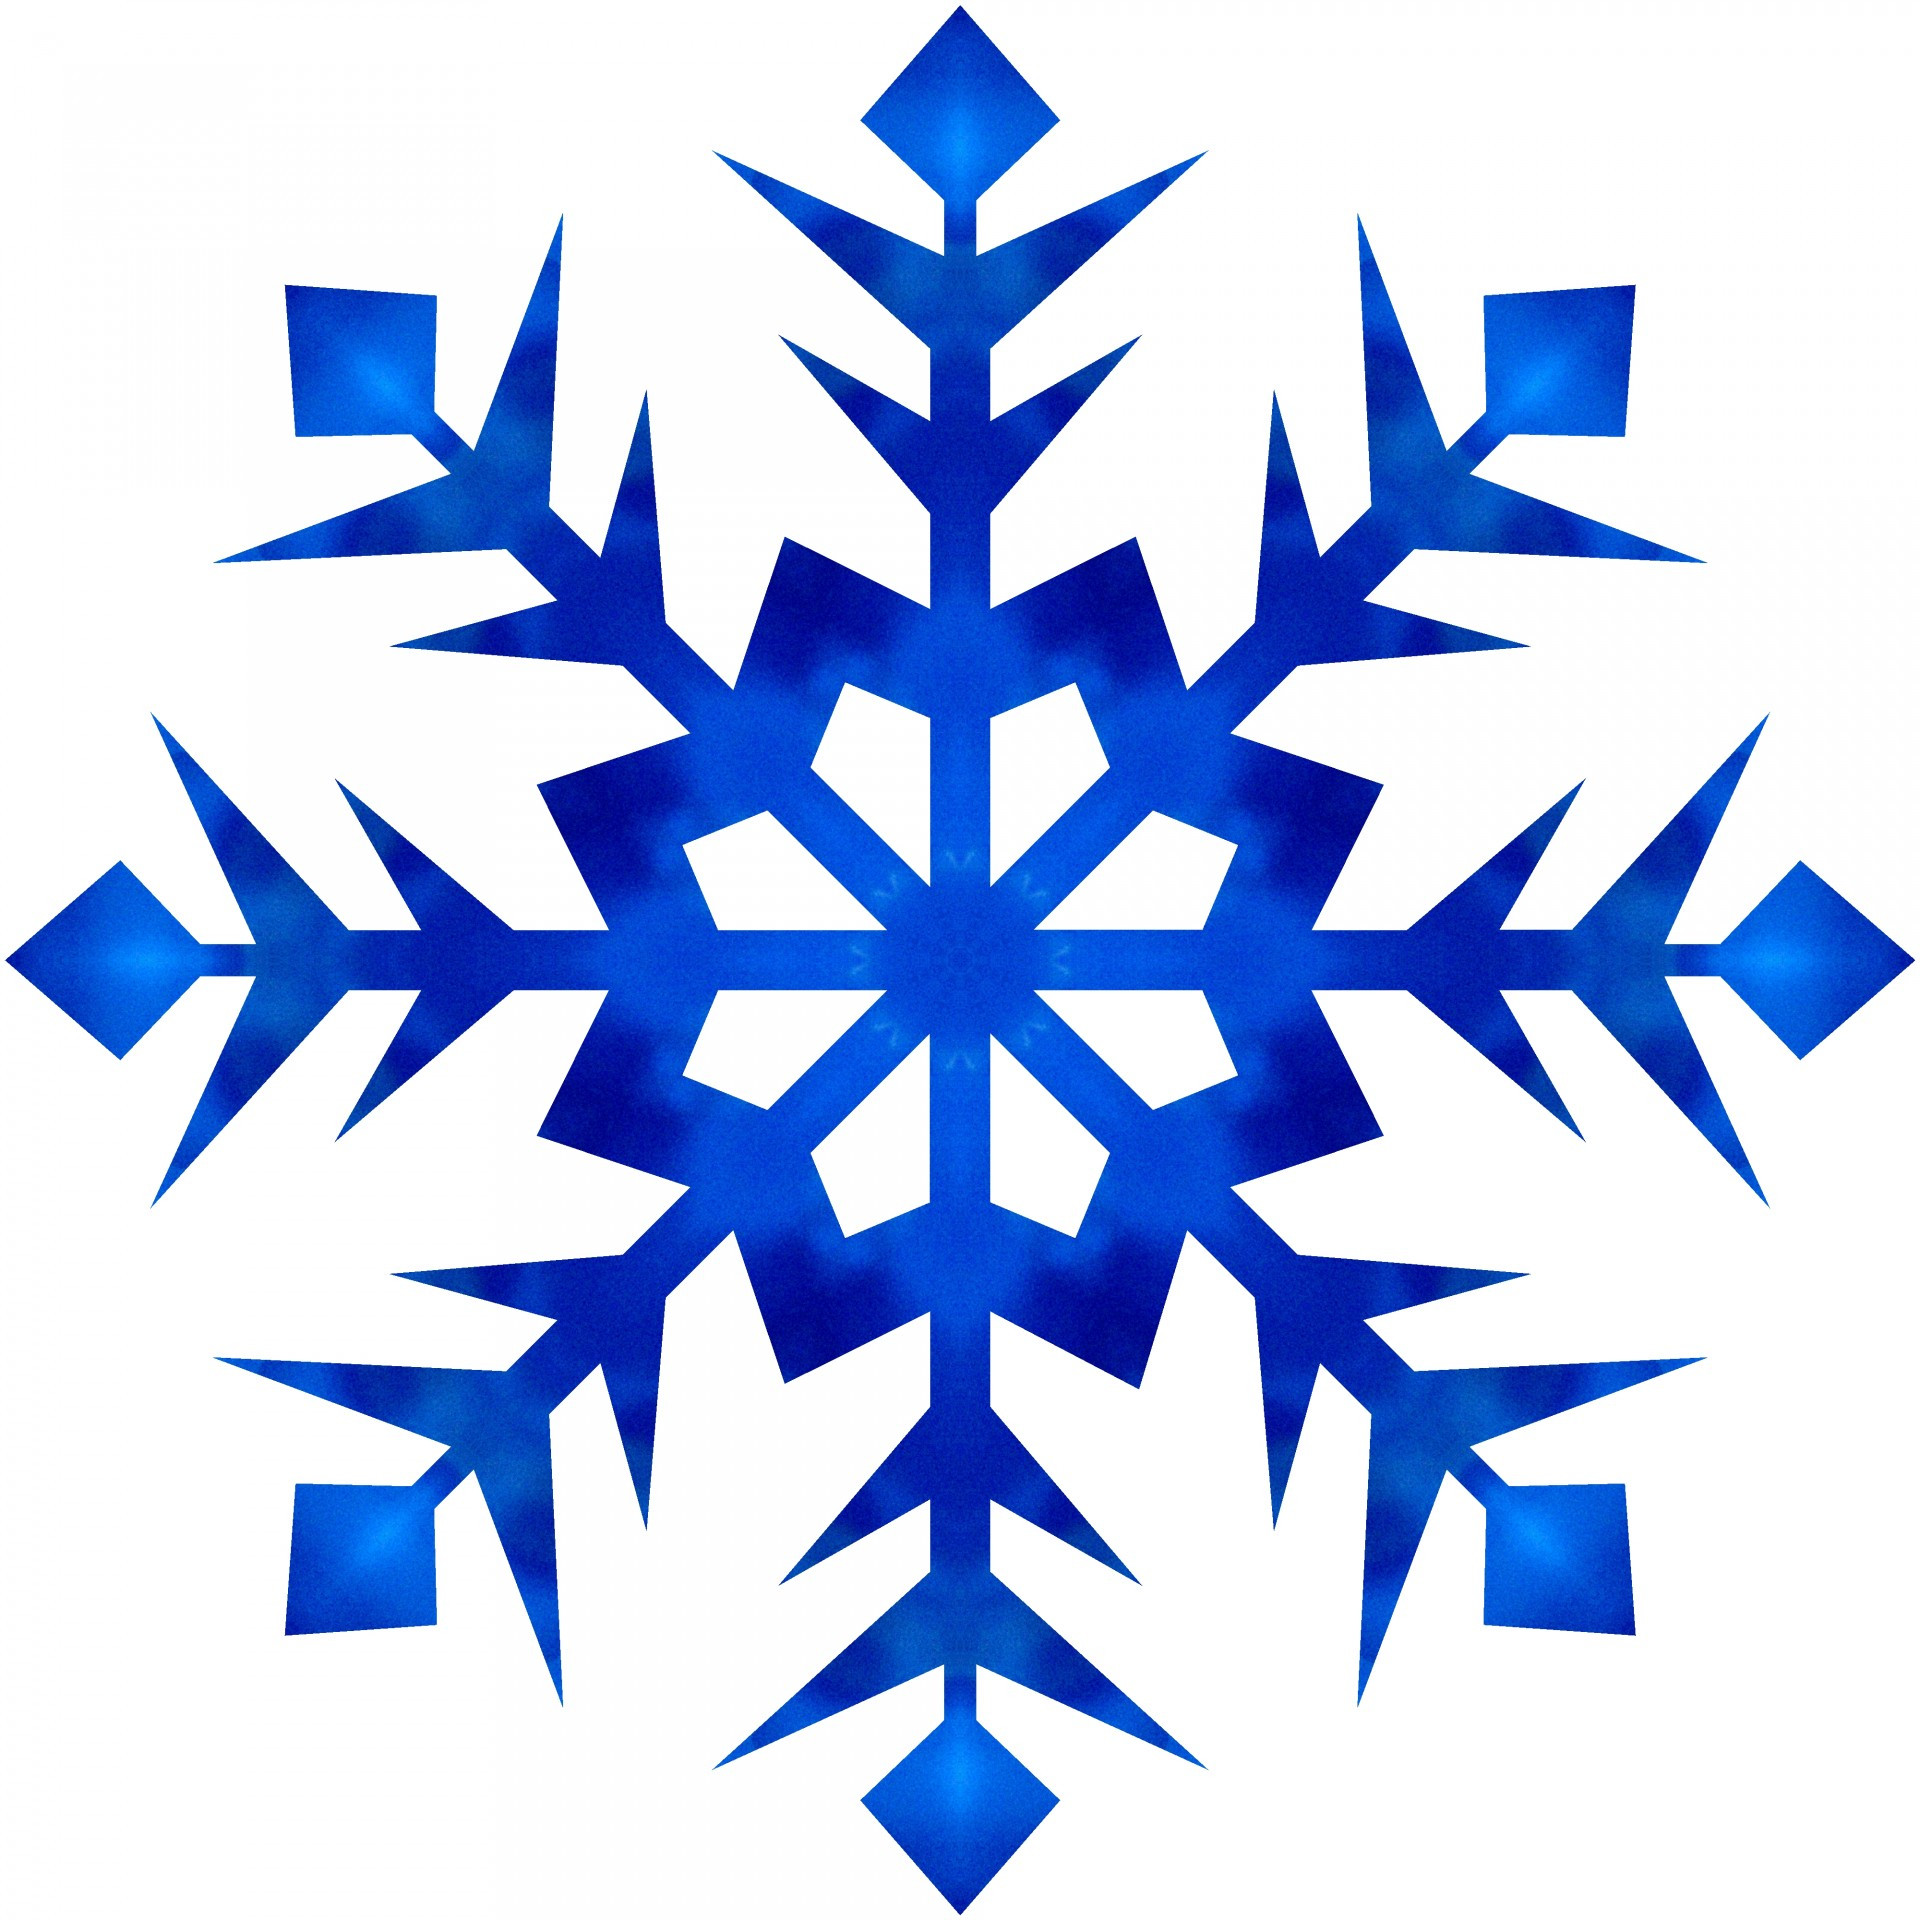 Картинки со снежинкой на белом фоне